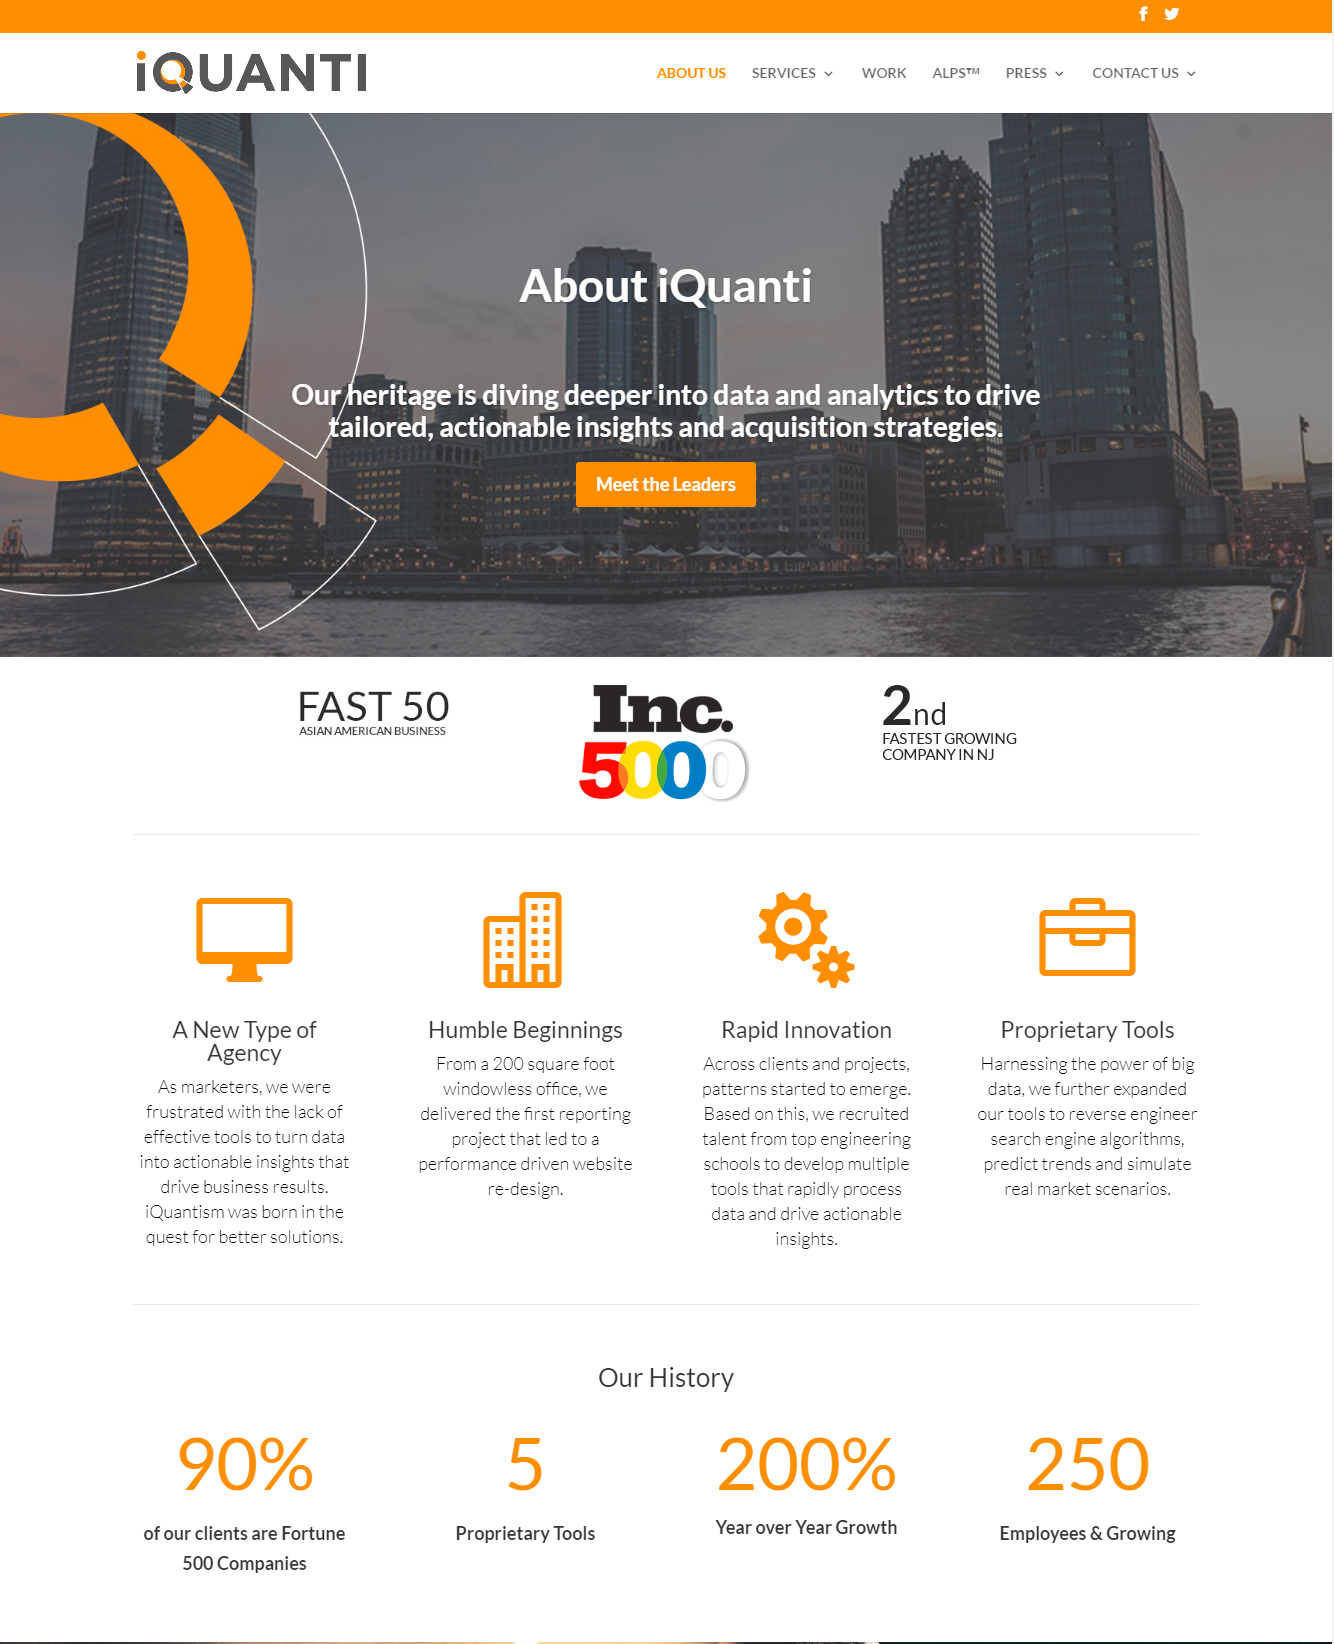 iQuanti, Inc. Demo - iQuanti | Digital Marketing Strategy for Enterprise Companies